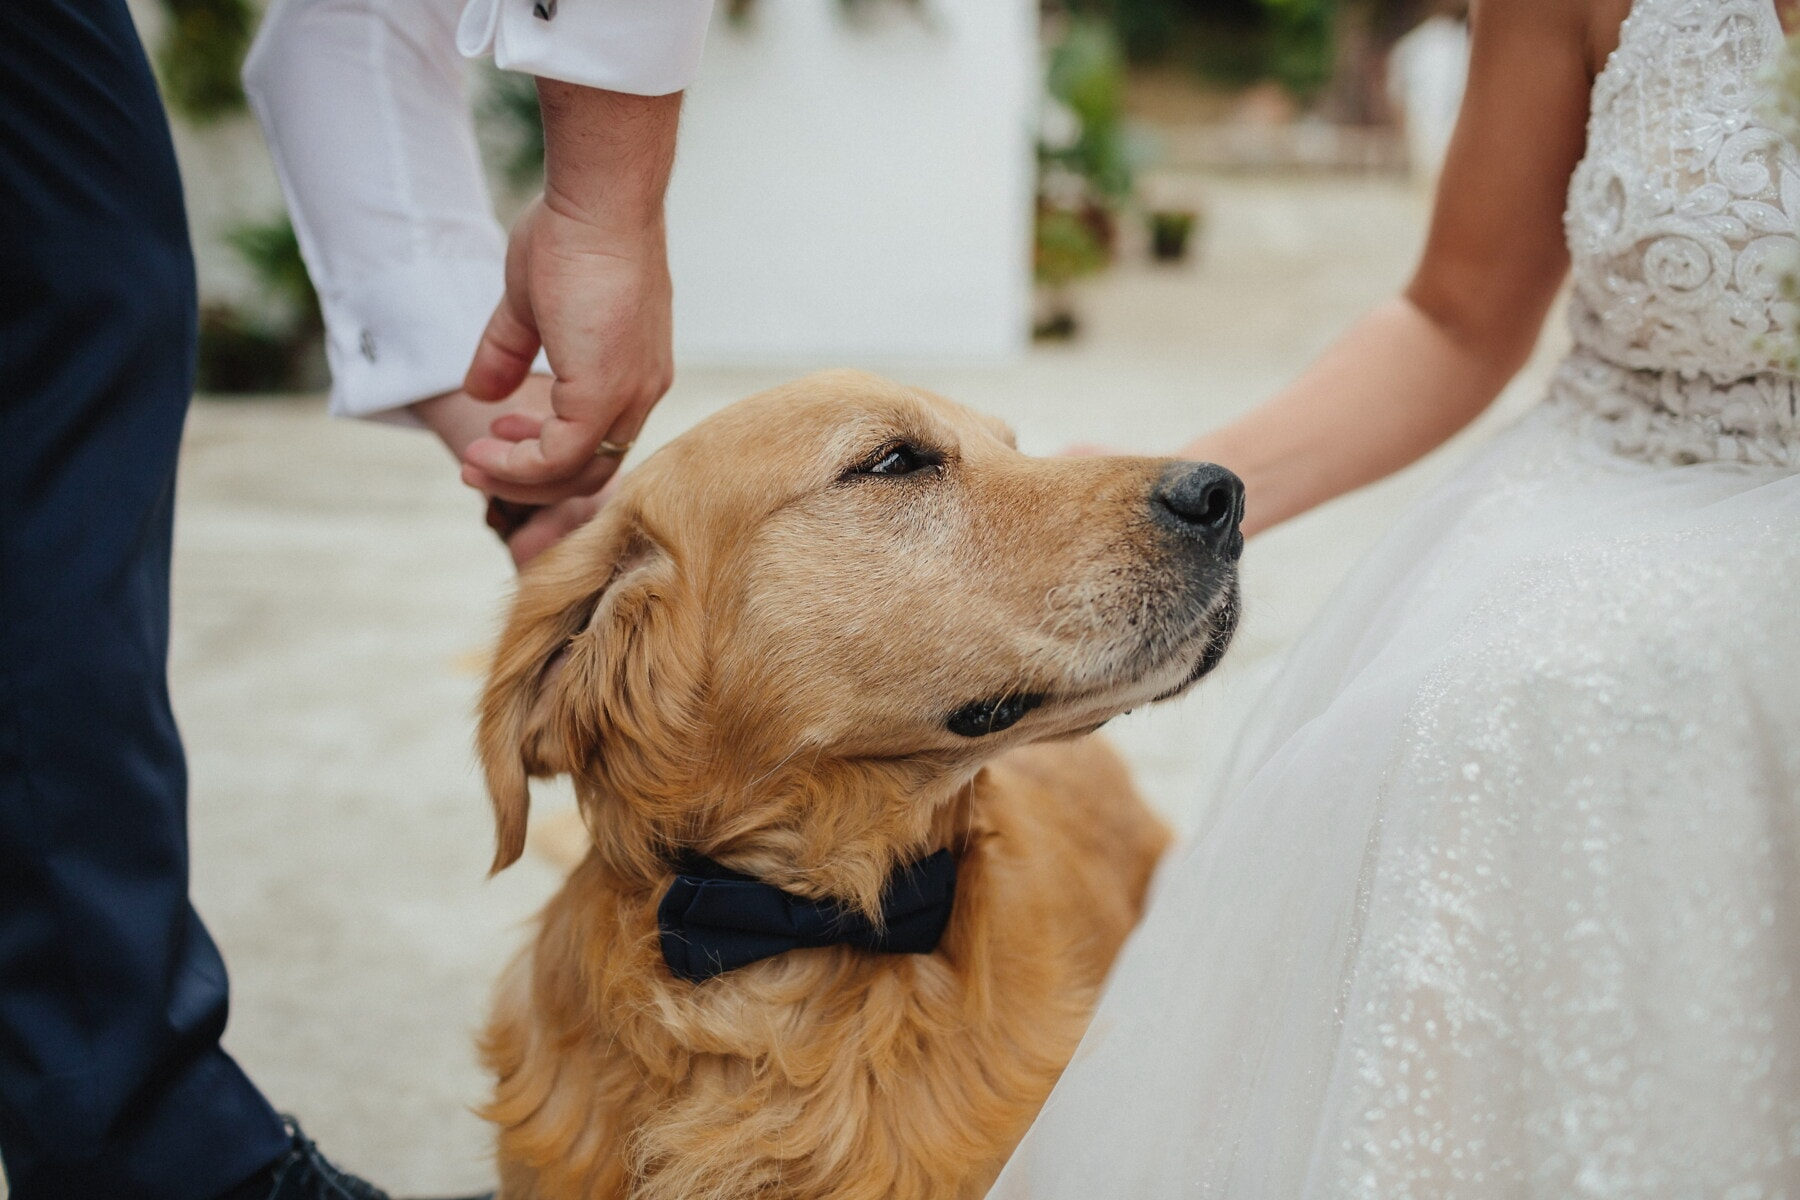 dog, bowtie, retriever, hunting dog, pet, cute, puppy, love, woman, groom